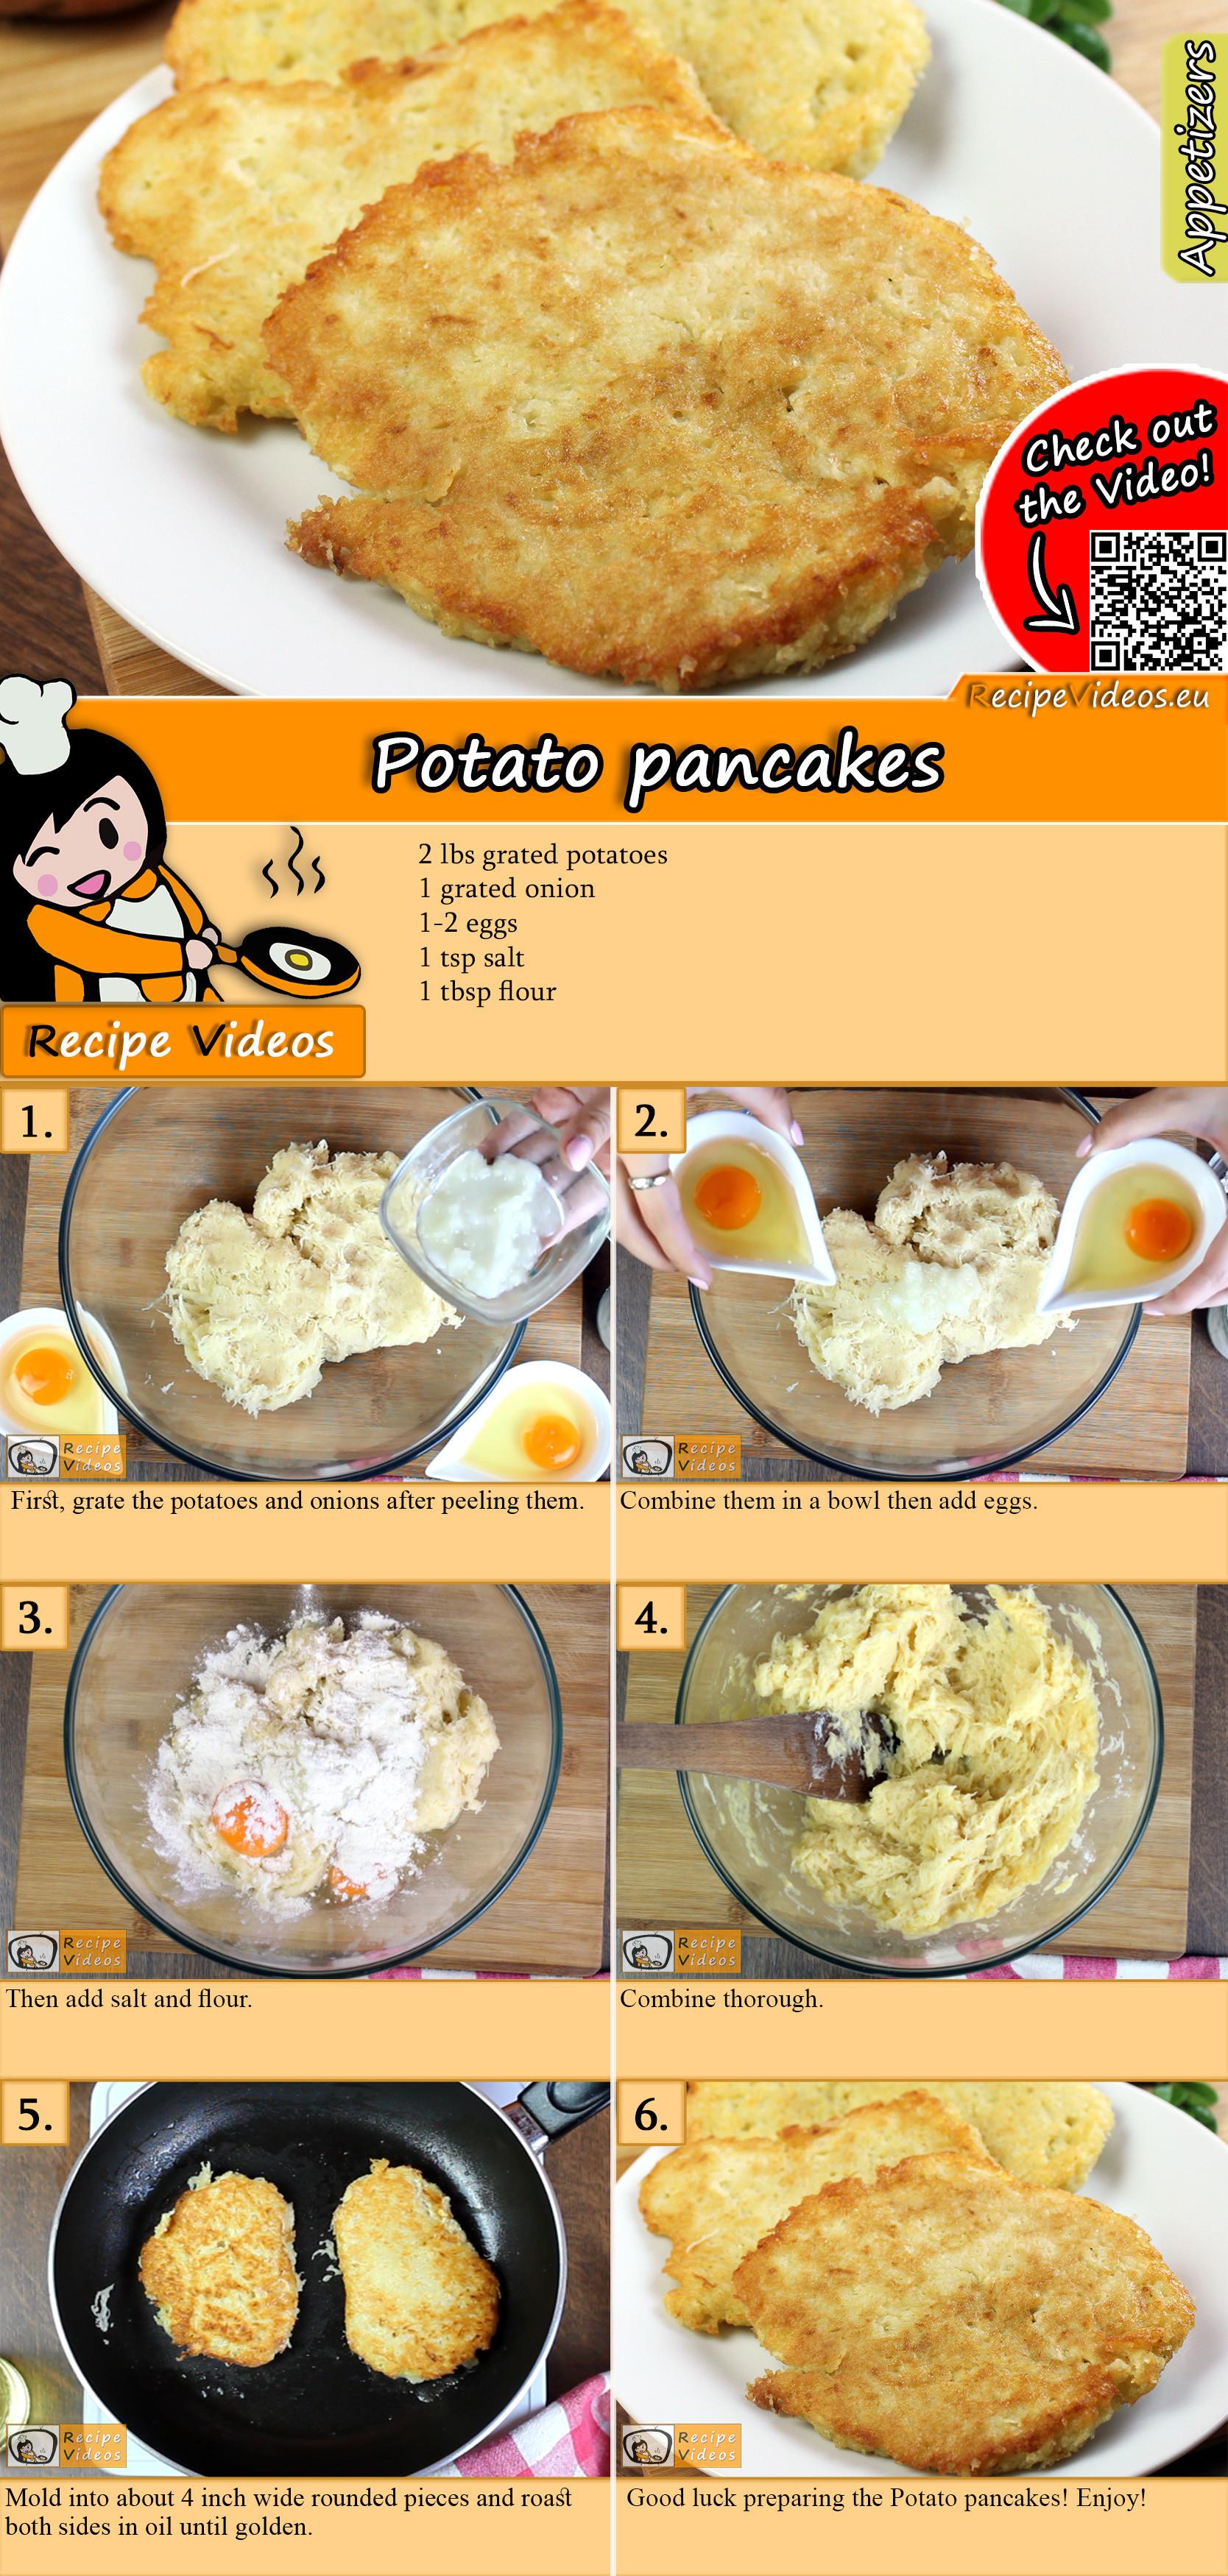 Potato pancakes recipe with video